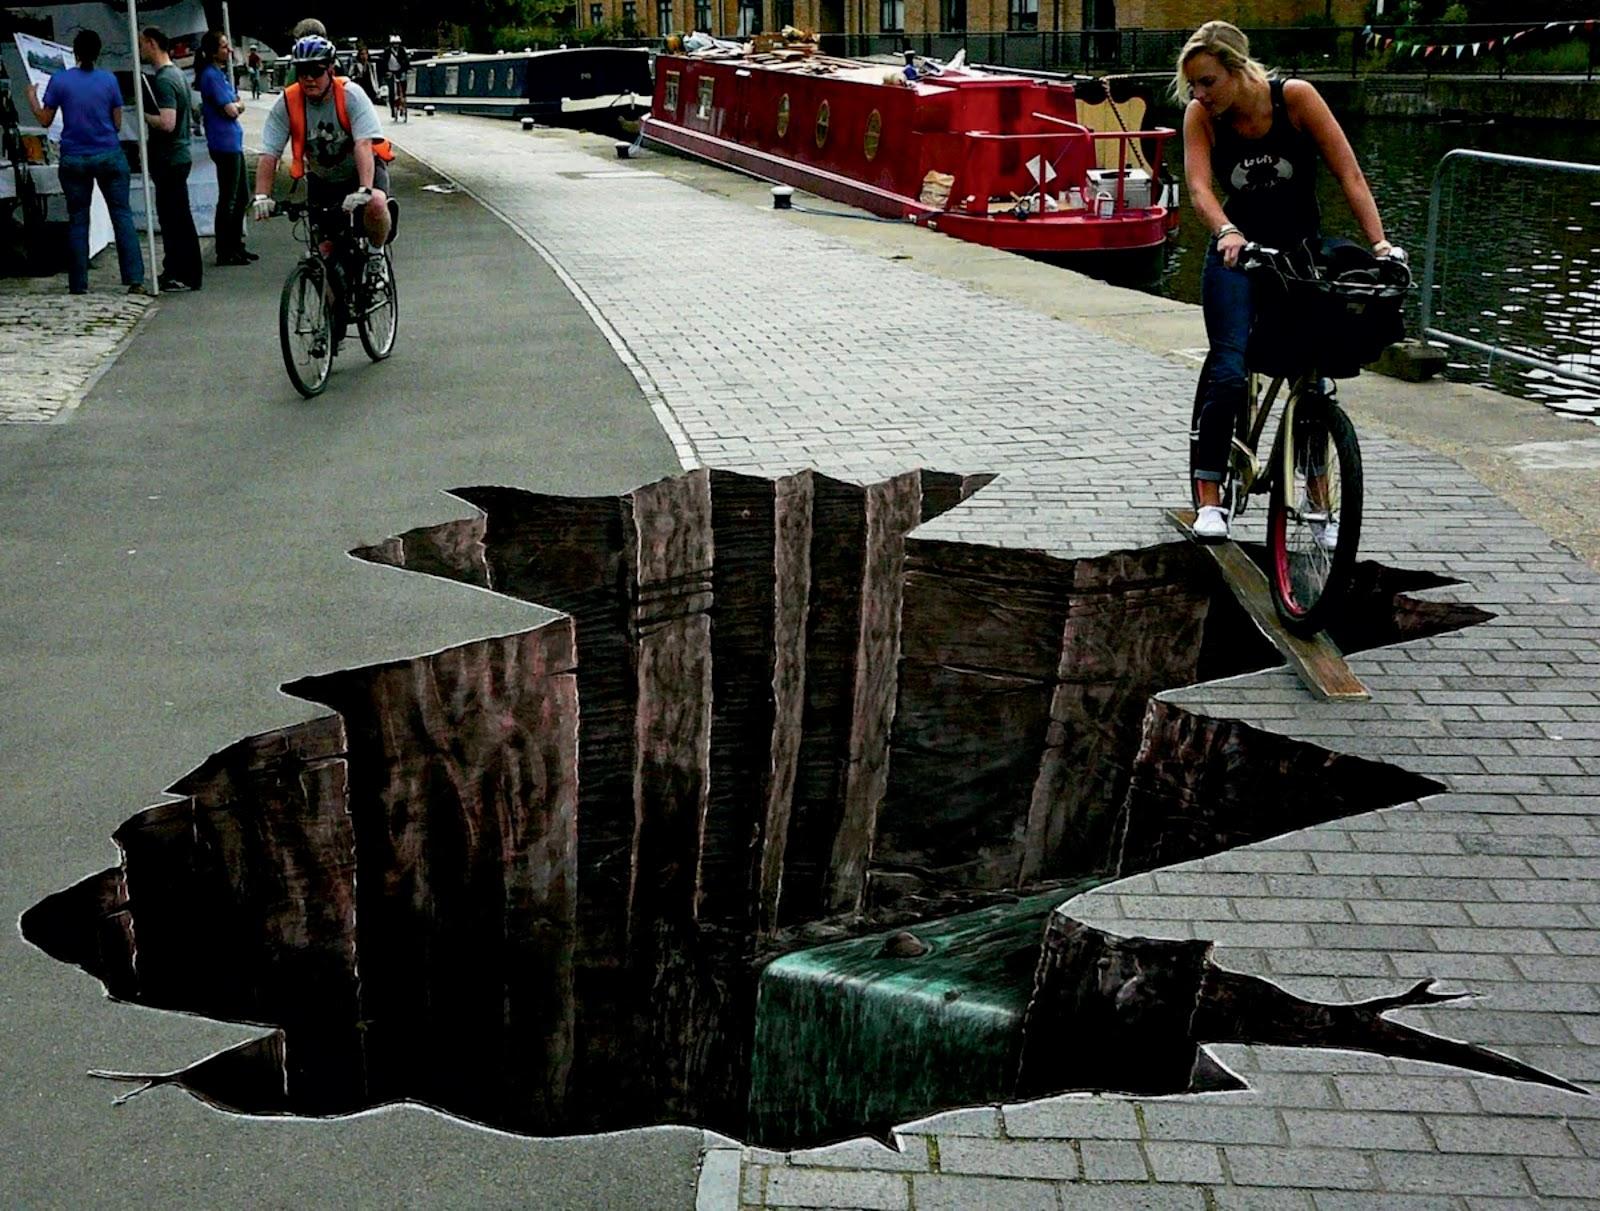 The Amazing 3D Street Art In West Dock